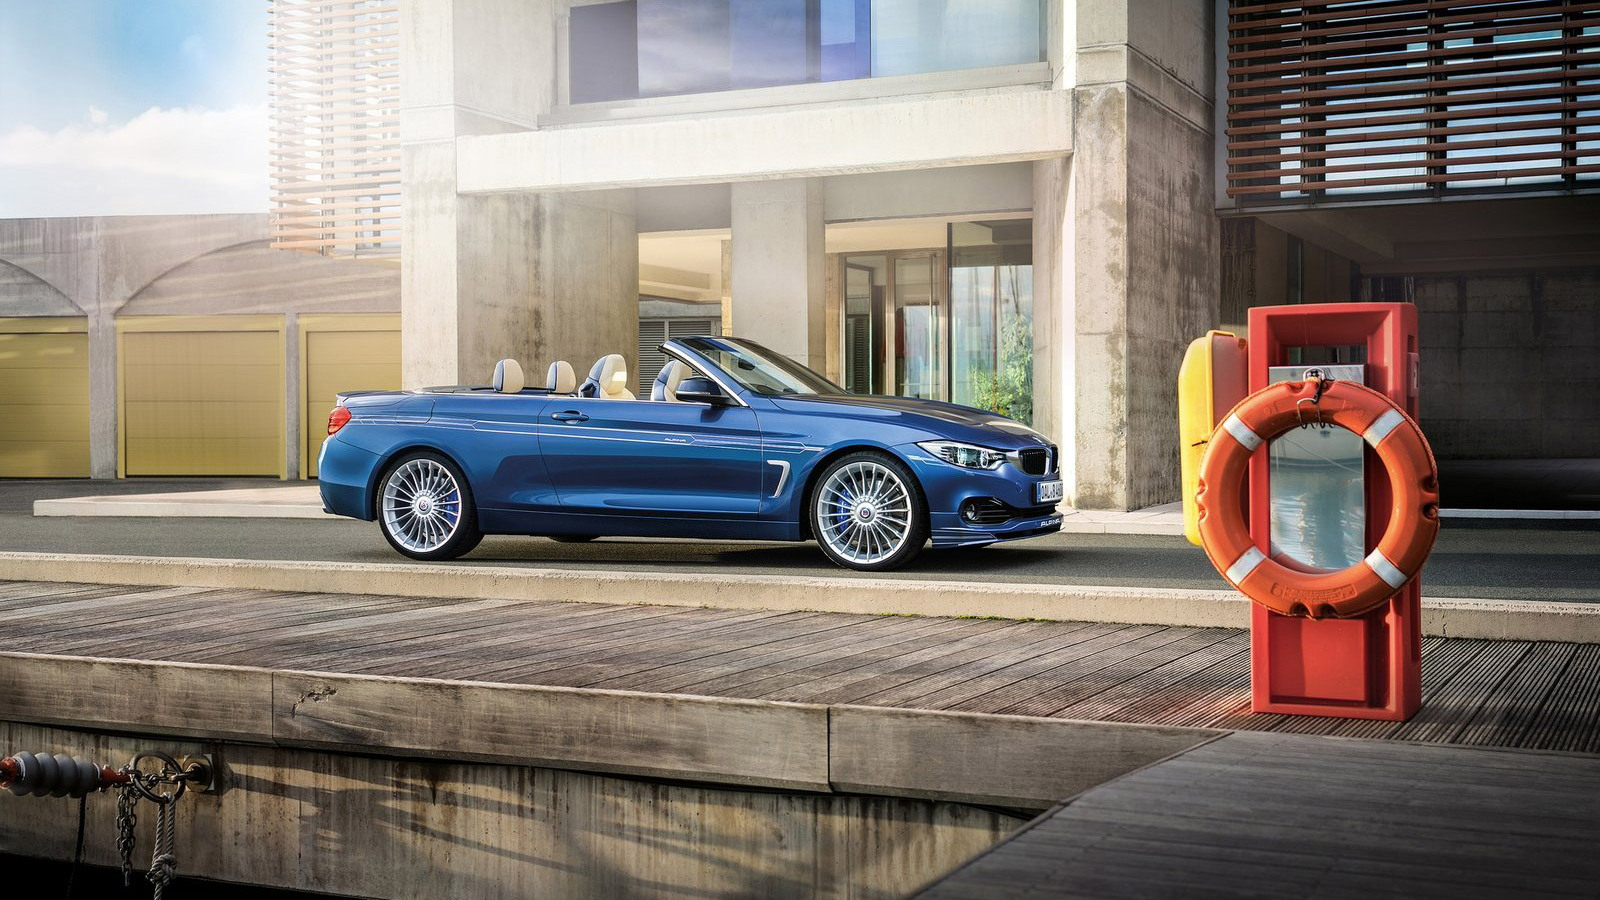 2014 BMW Alpina B4 Biturbo Cabrio